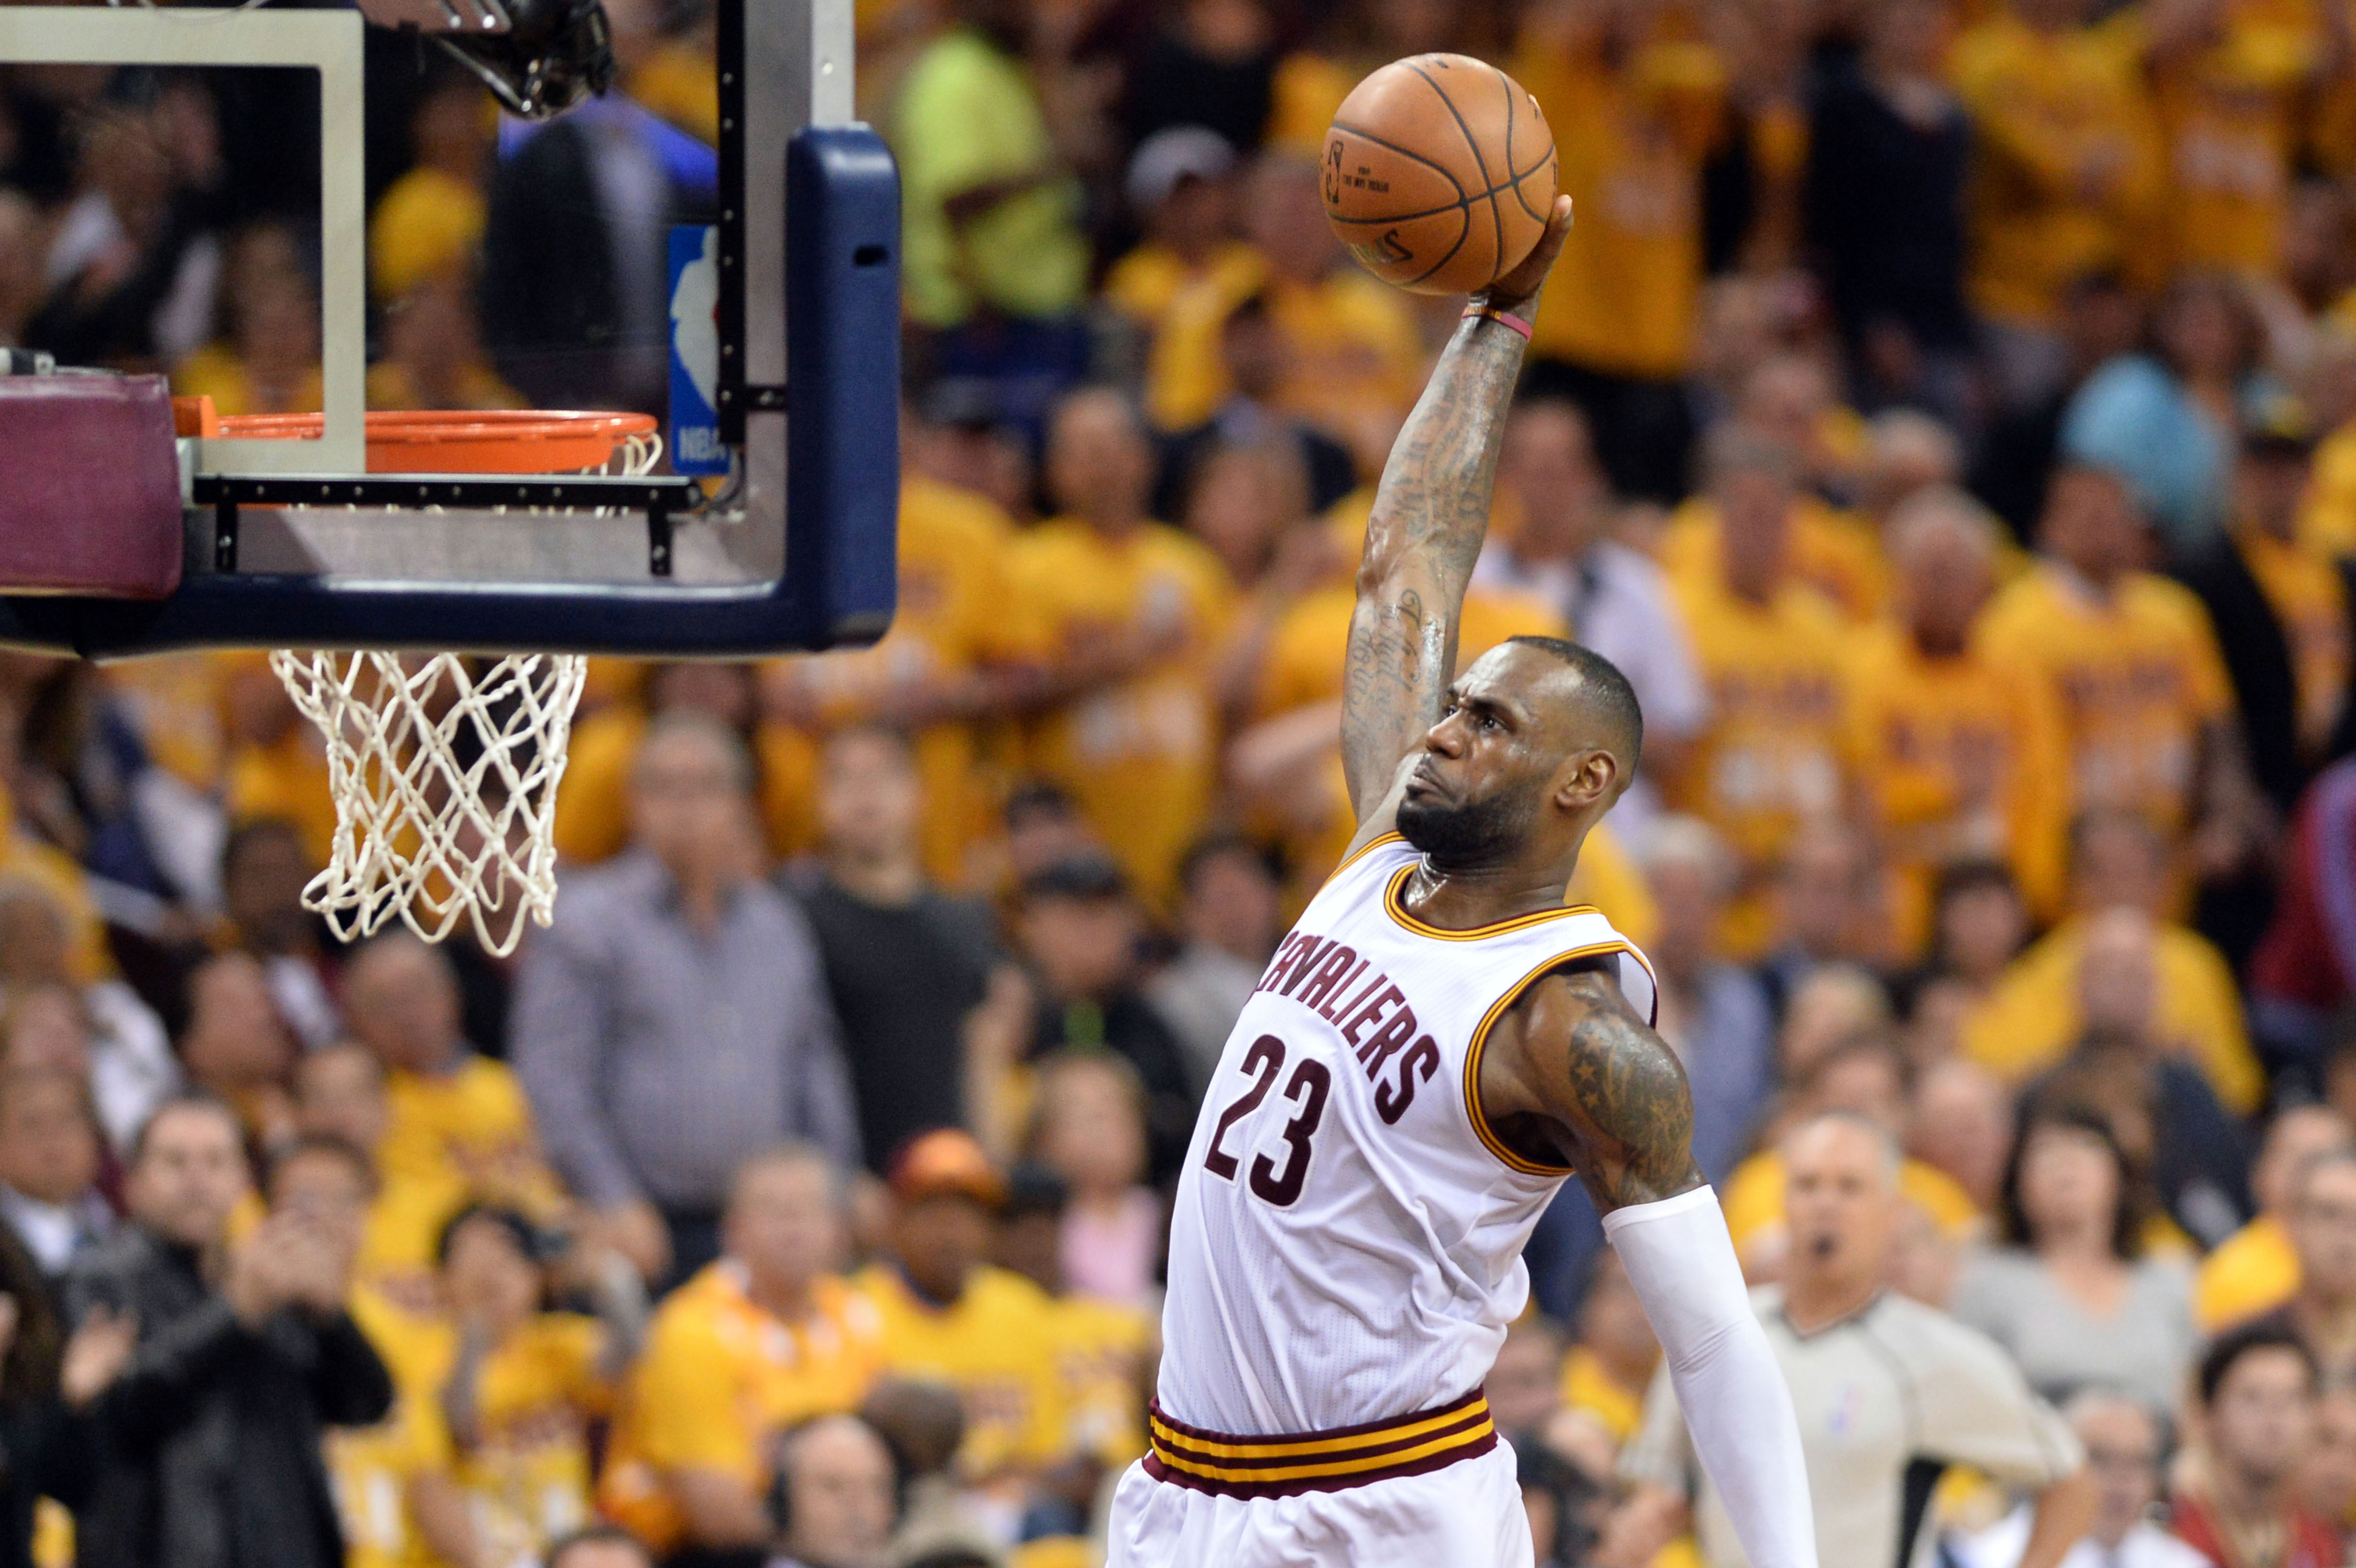 LIVE UPDATES Cleveland Cavaliers Vs Toronto Raptors